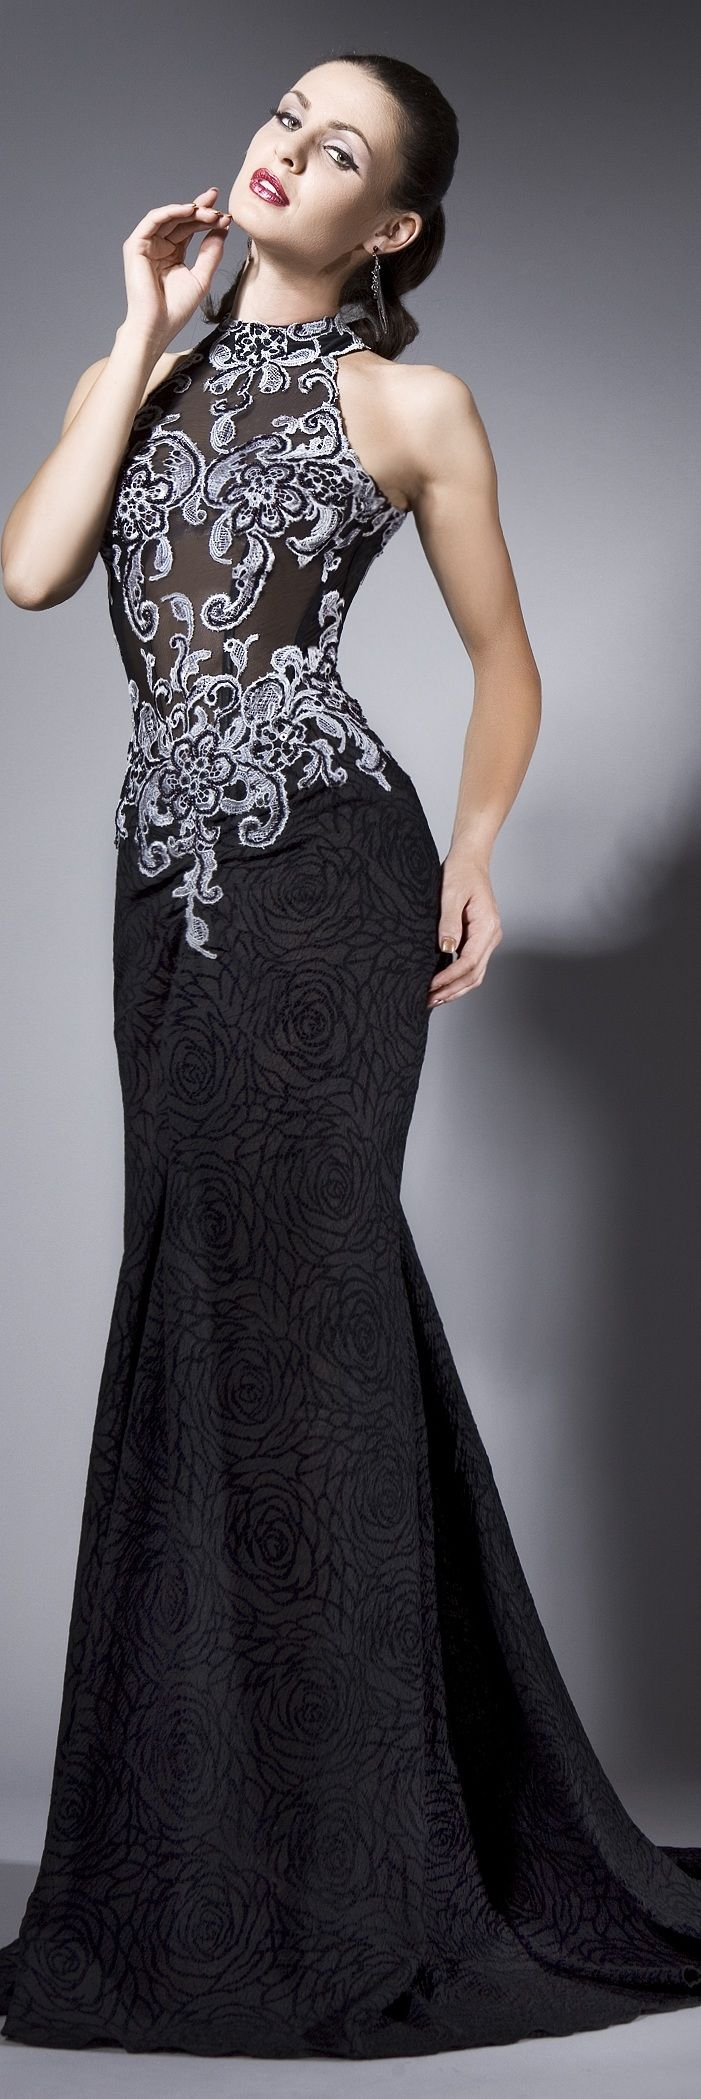 Bien Savvy - haute couture 2013. Black Dress #2dayslook #sasssjane #BlackDress www.2dayslook.com